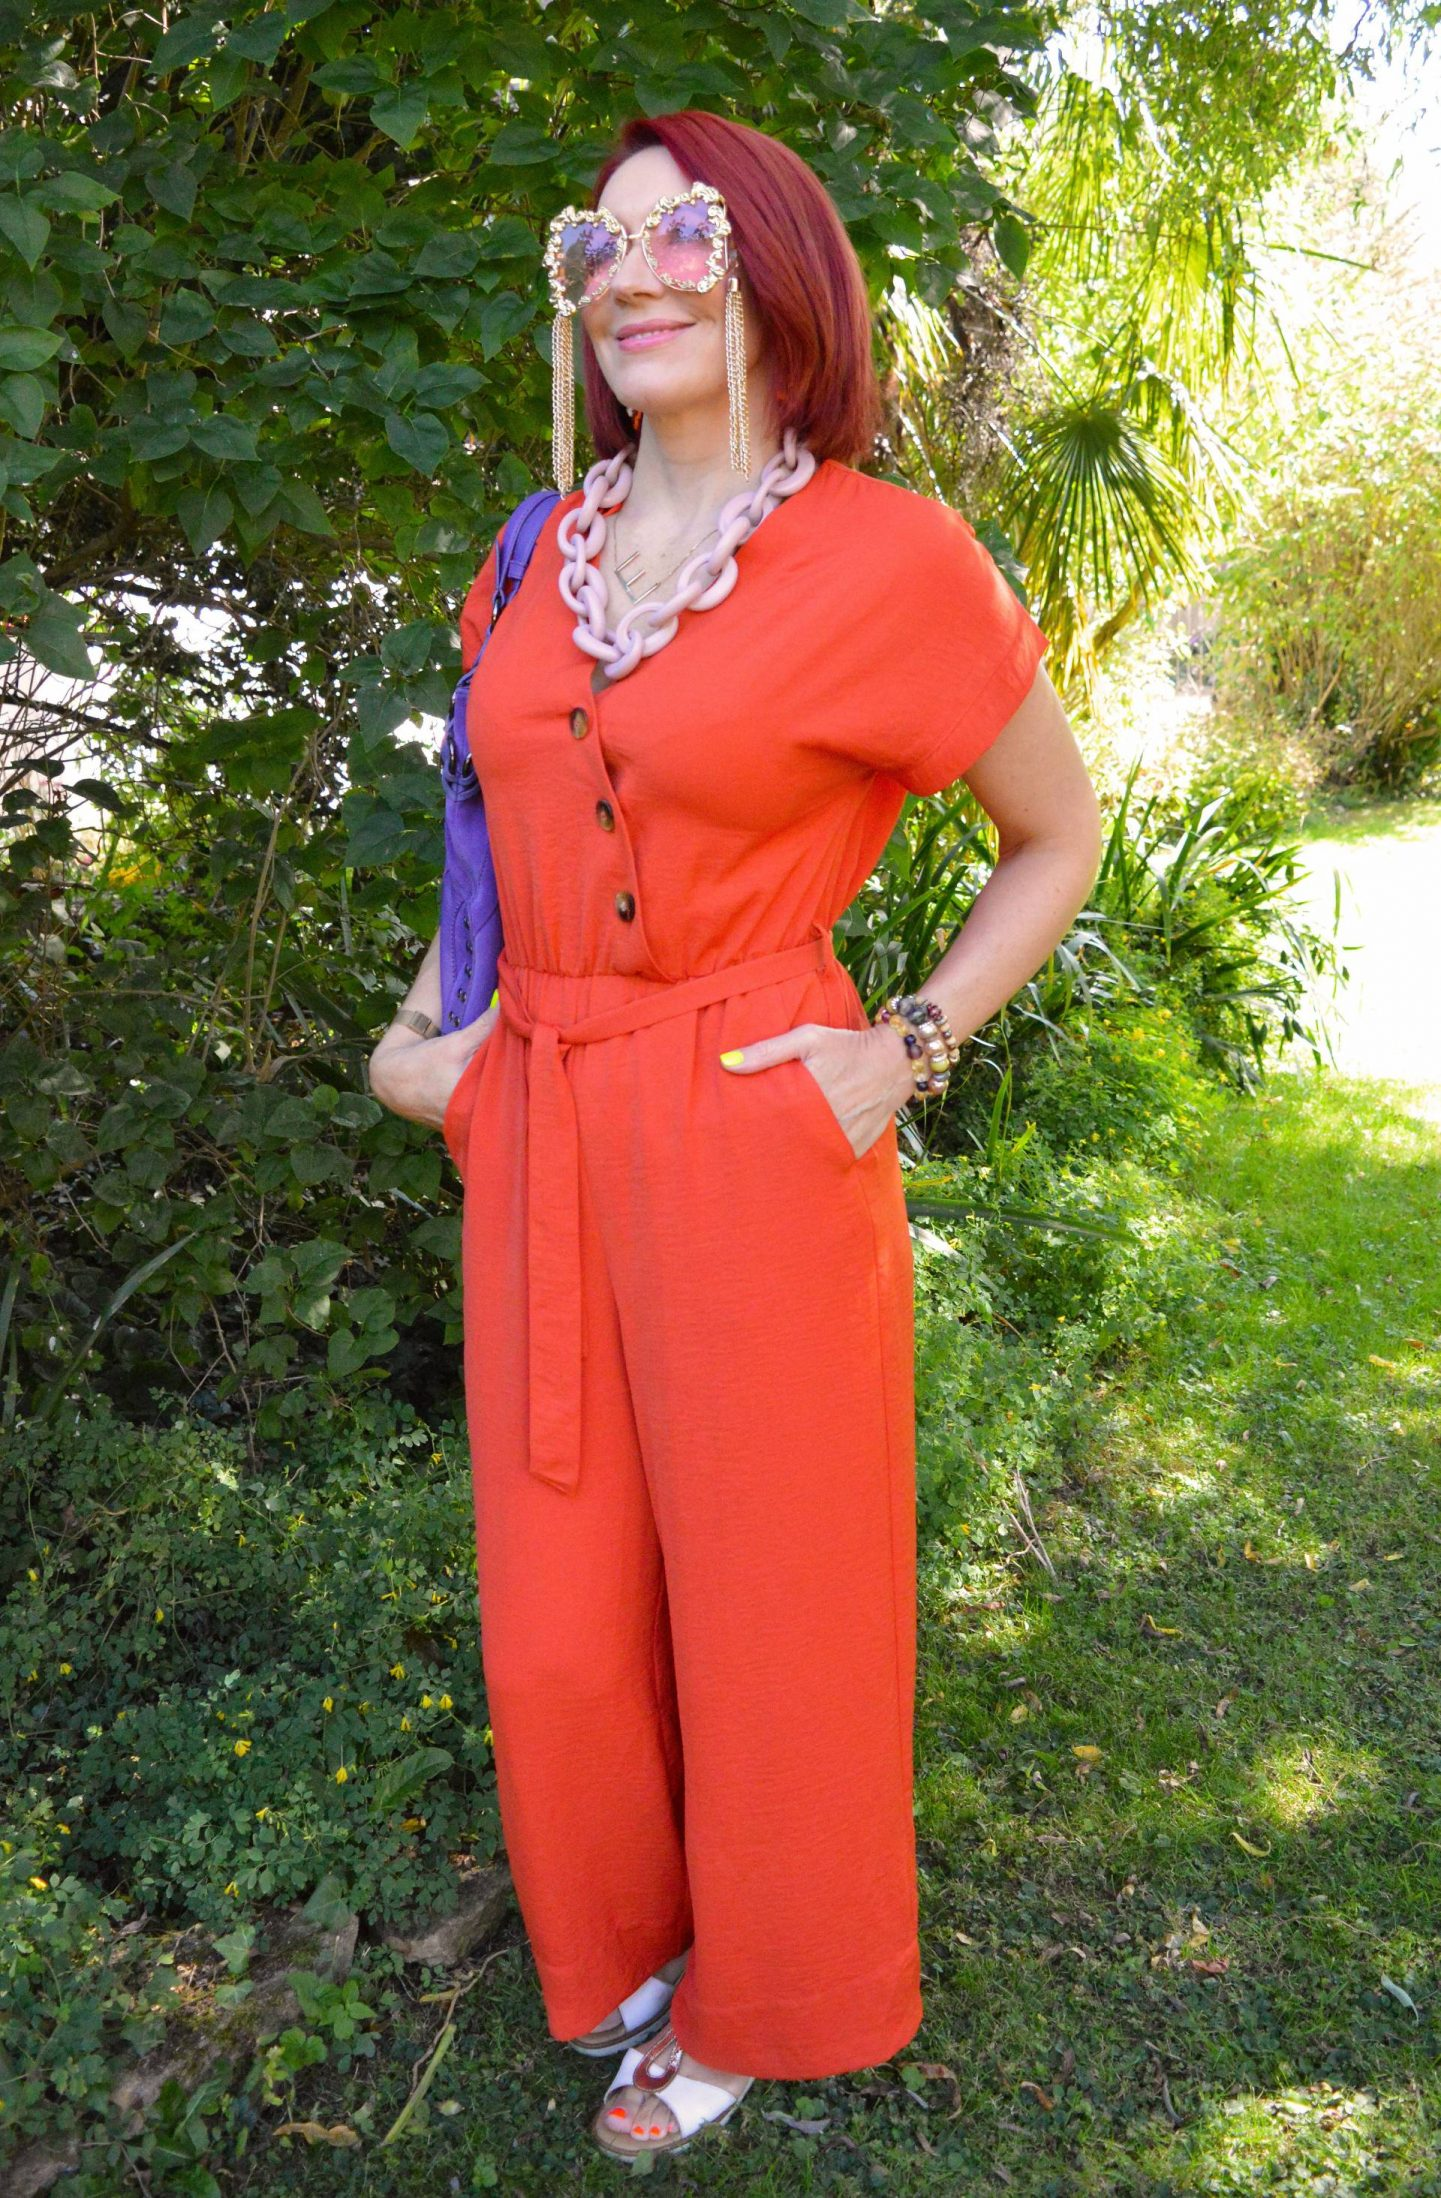 Orange Belted Jumpsuit, Ri2k purple bag, Meghan Fabulous gold sunglasses